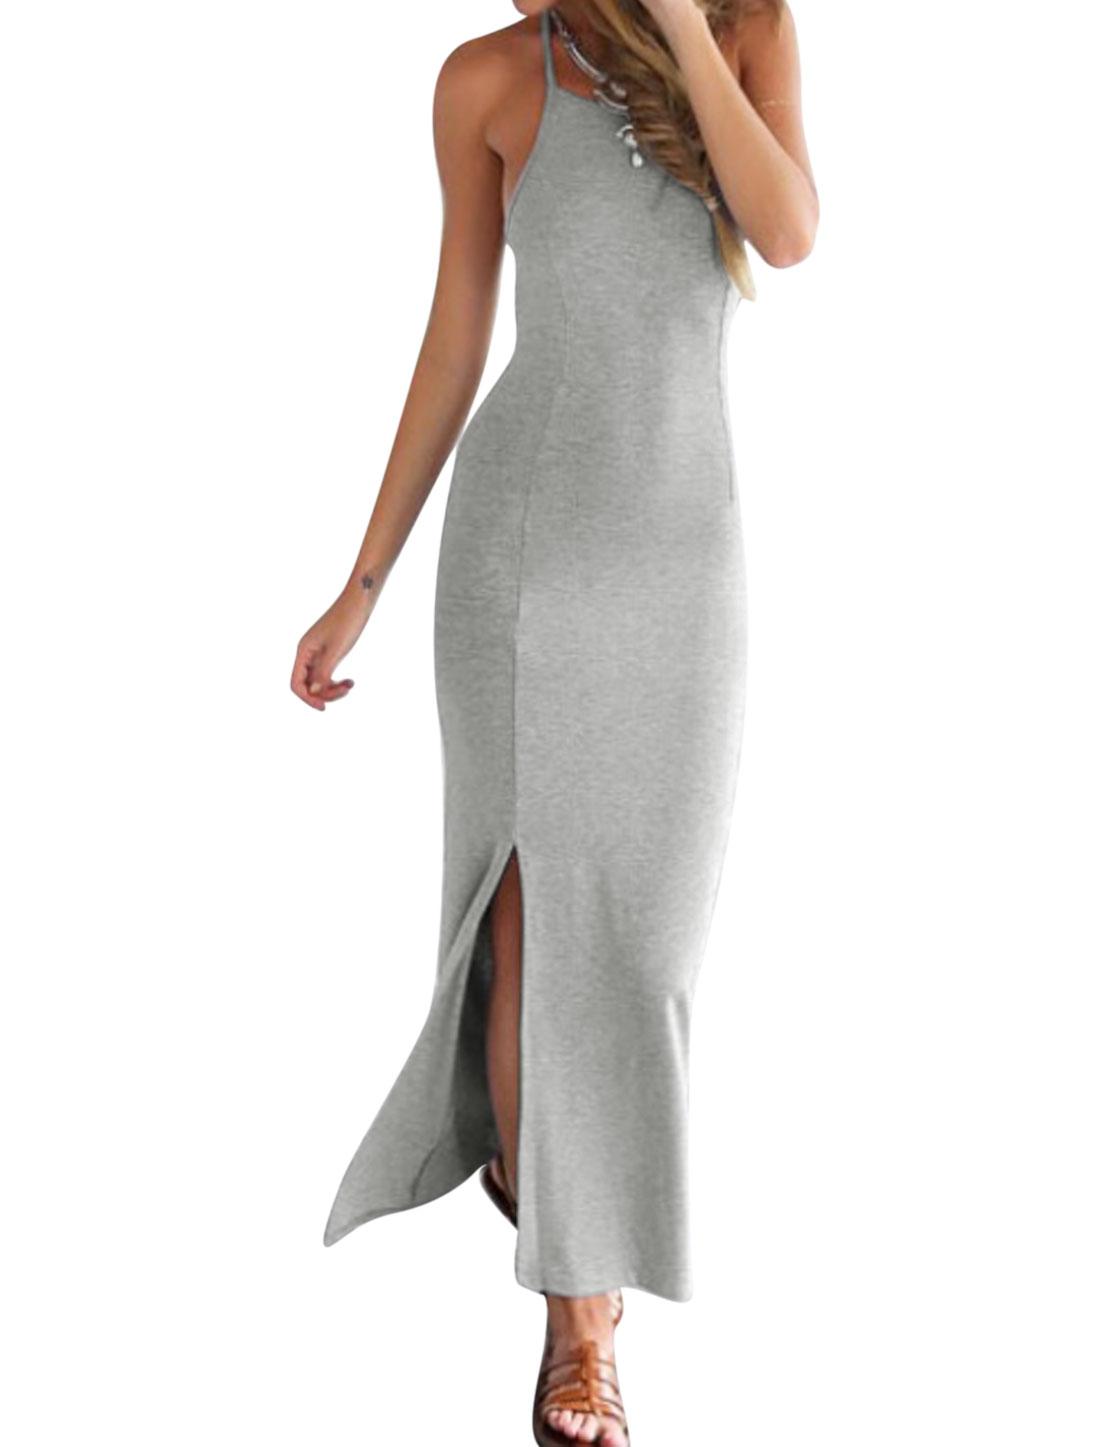 Ladies Halter Neck Split Hem Open Back Casual Maxi Dress Light Gray S